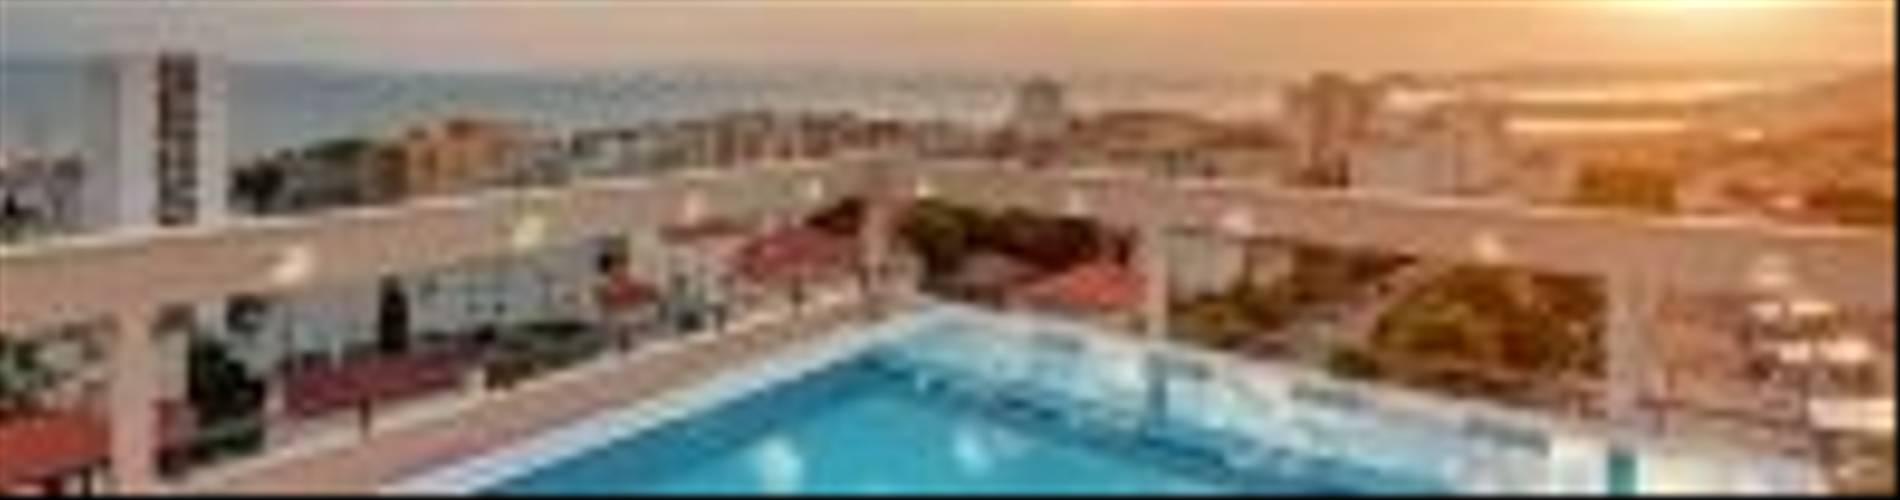 HotelResidence_DIOKLECIJAN_rooftop-pool-sunset-panorama_2048px_D53A2565-198x120.jpg